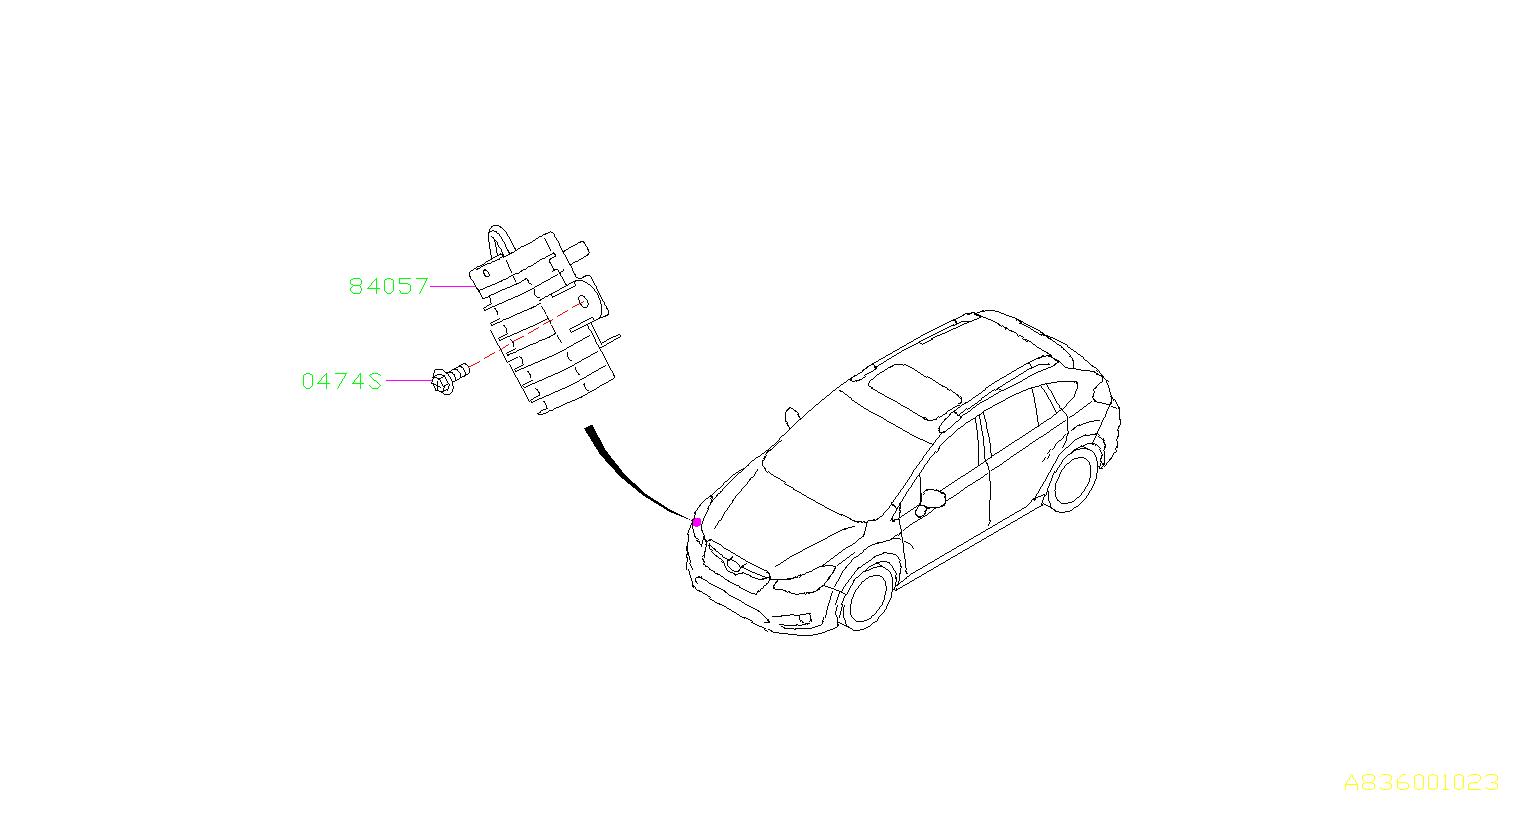 Subaru Crosstrek Resistor Assembly Daytime Running Lamp